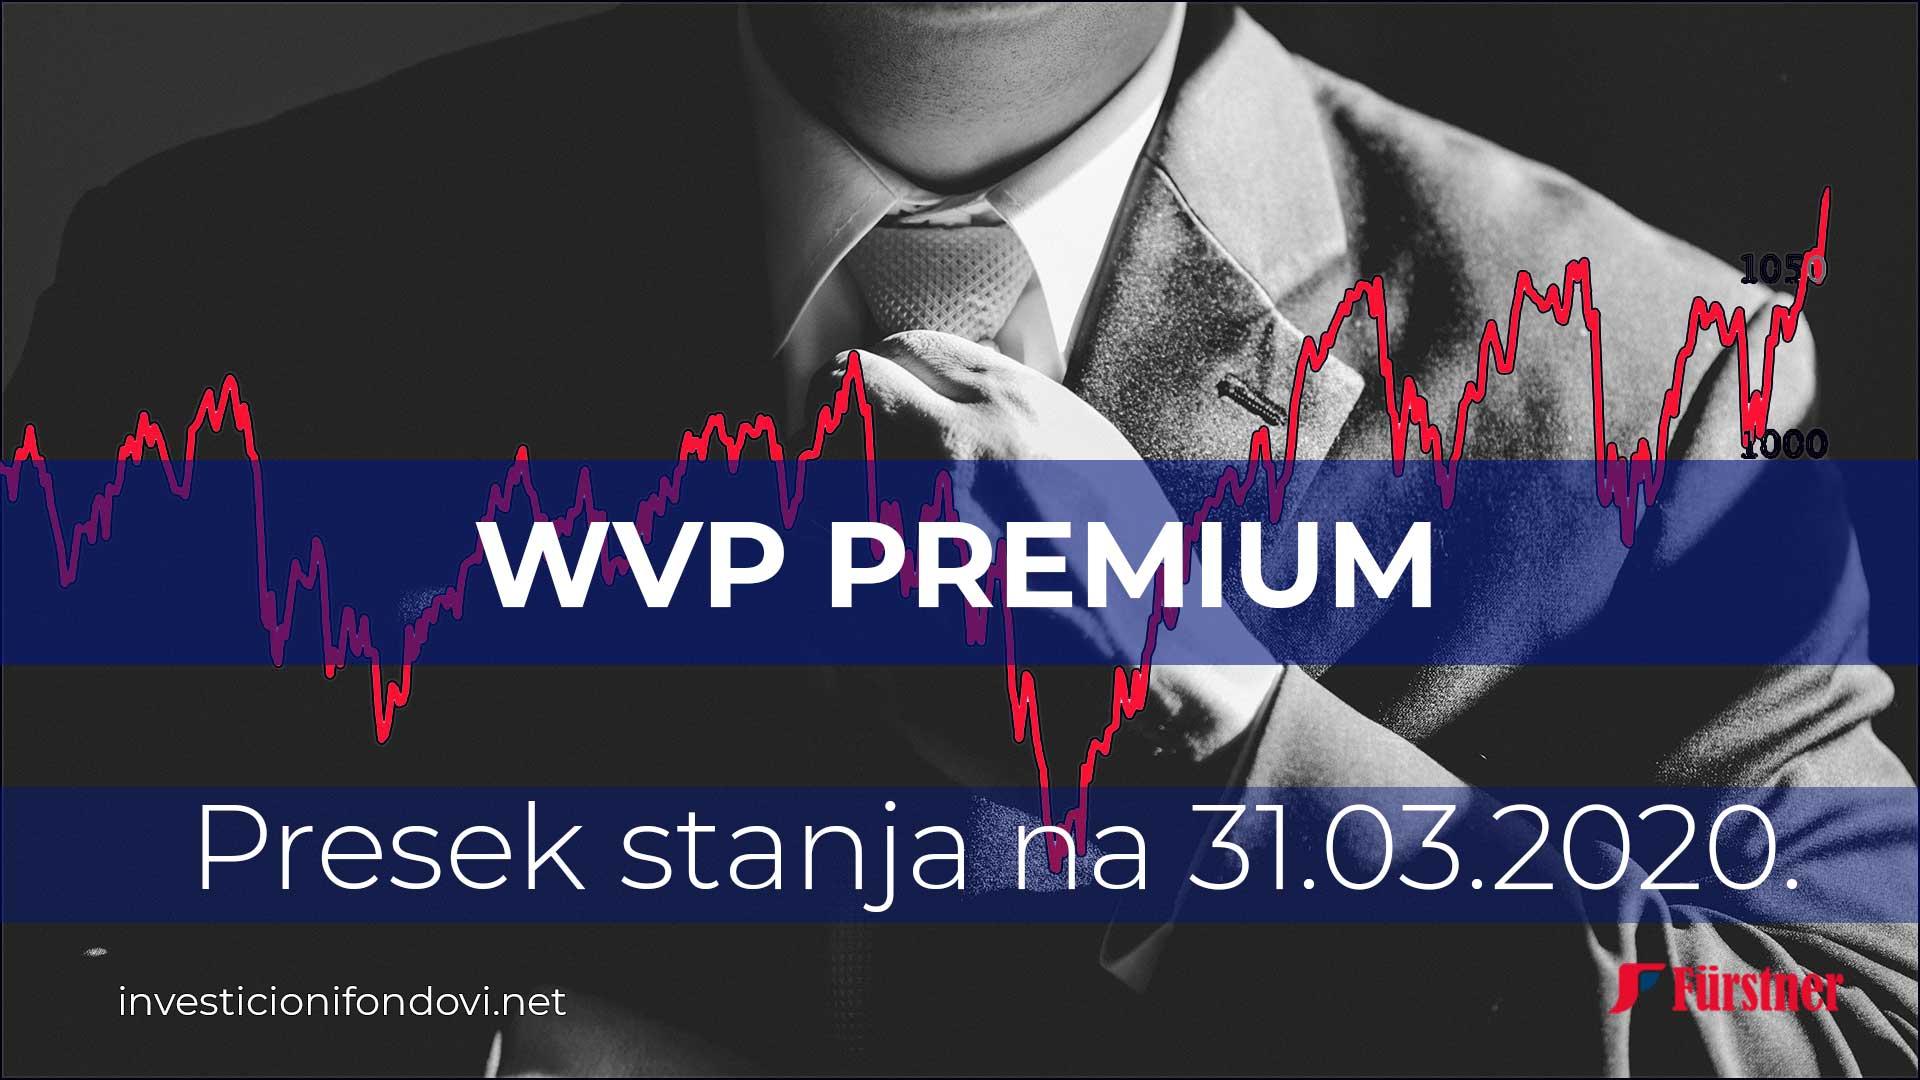 Presek stanja WVP Premium 31.03.2020. | Investicioni fondovi